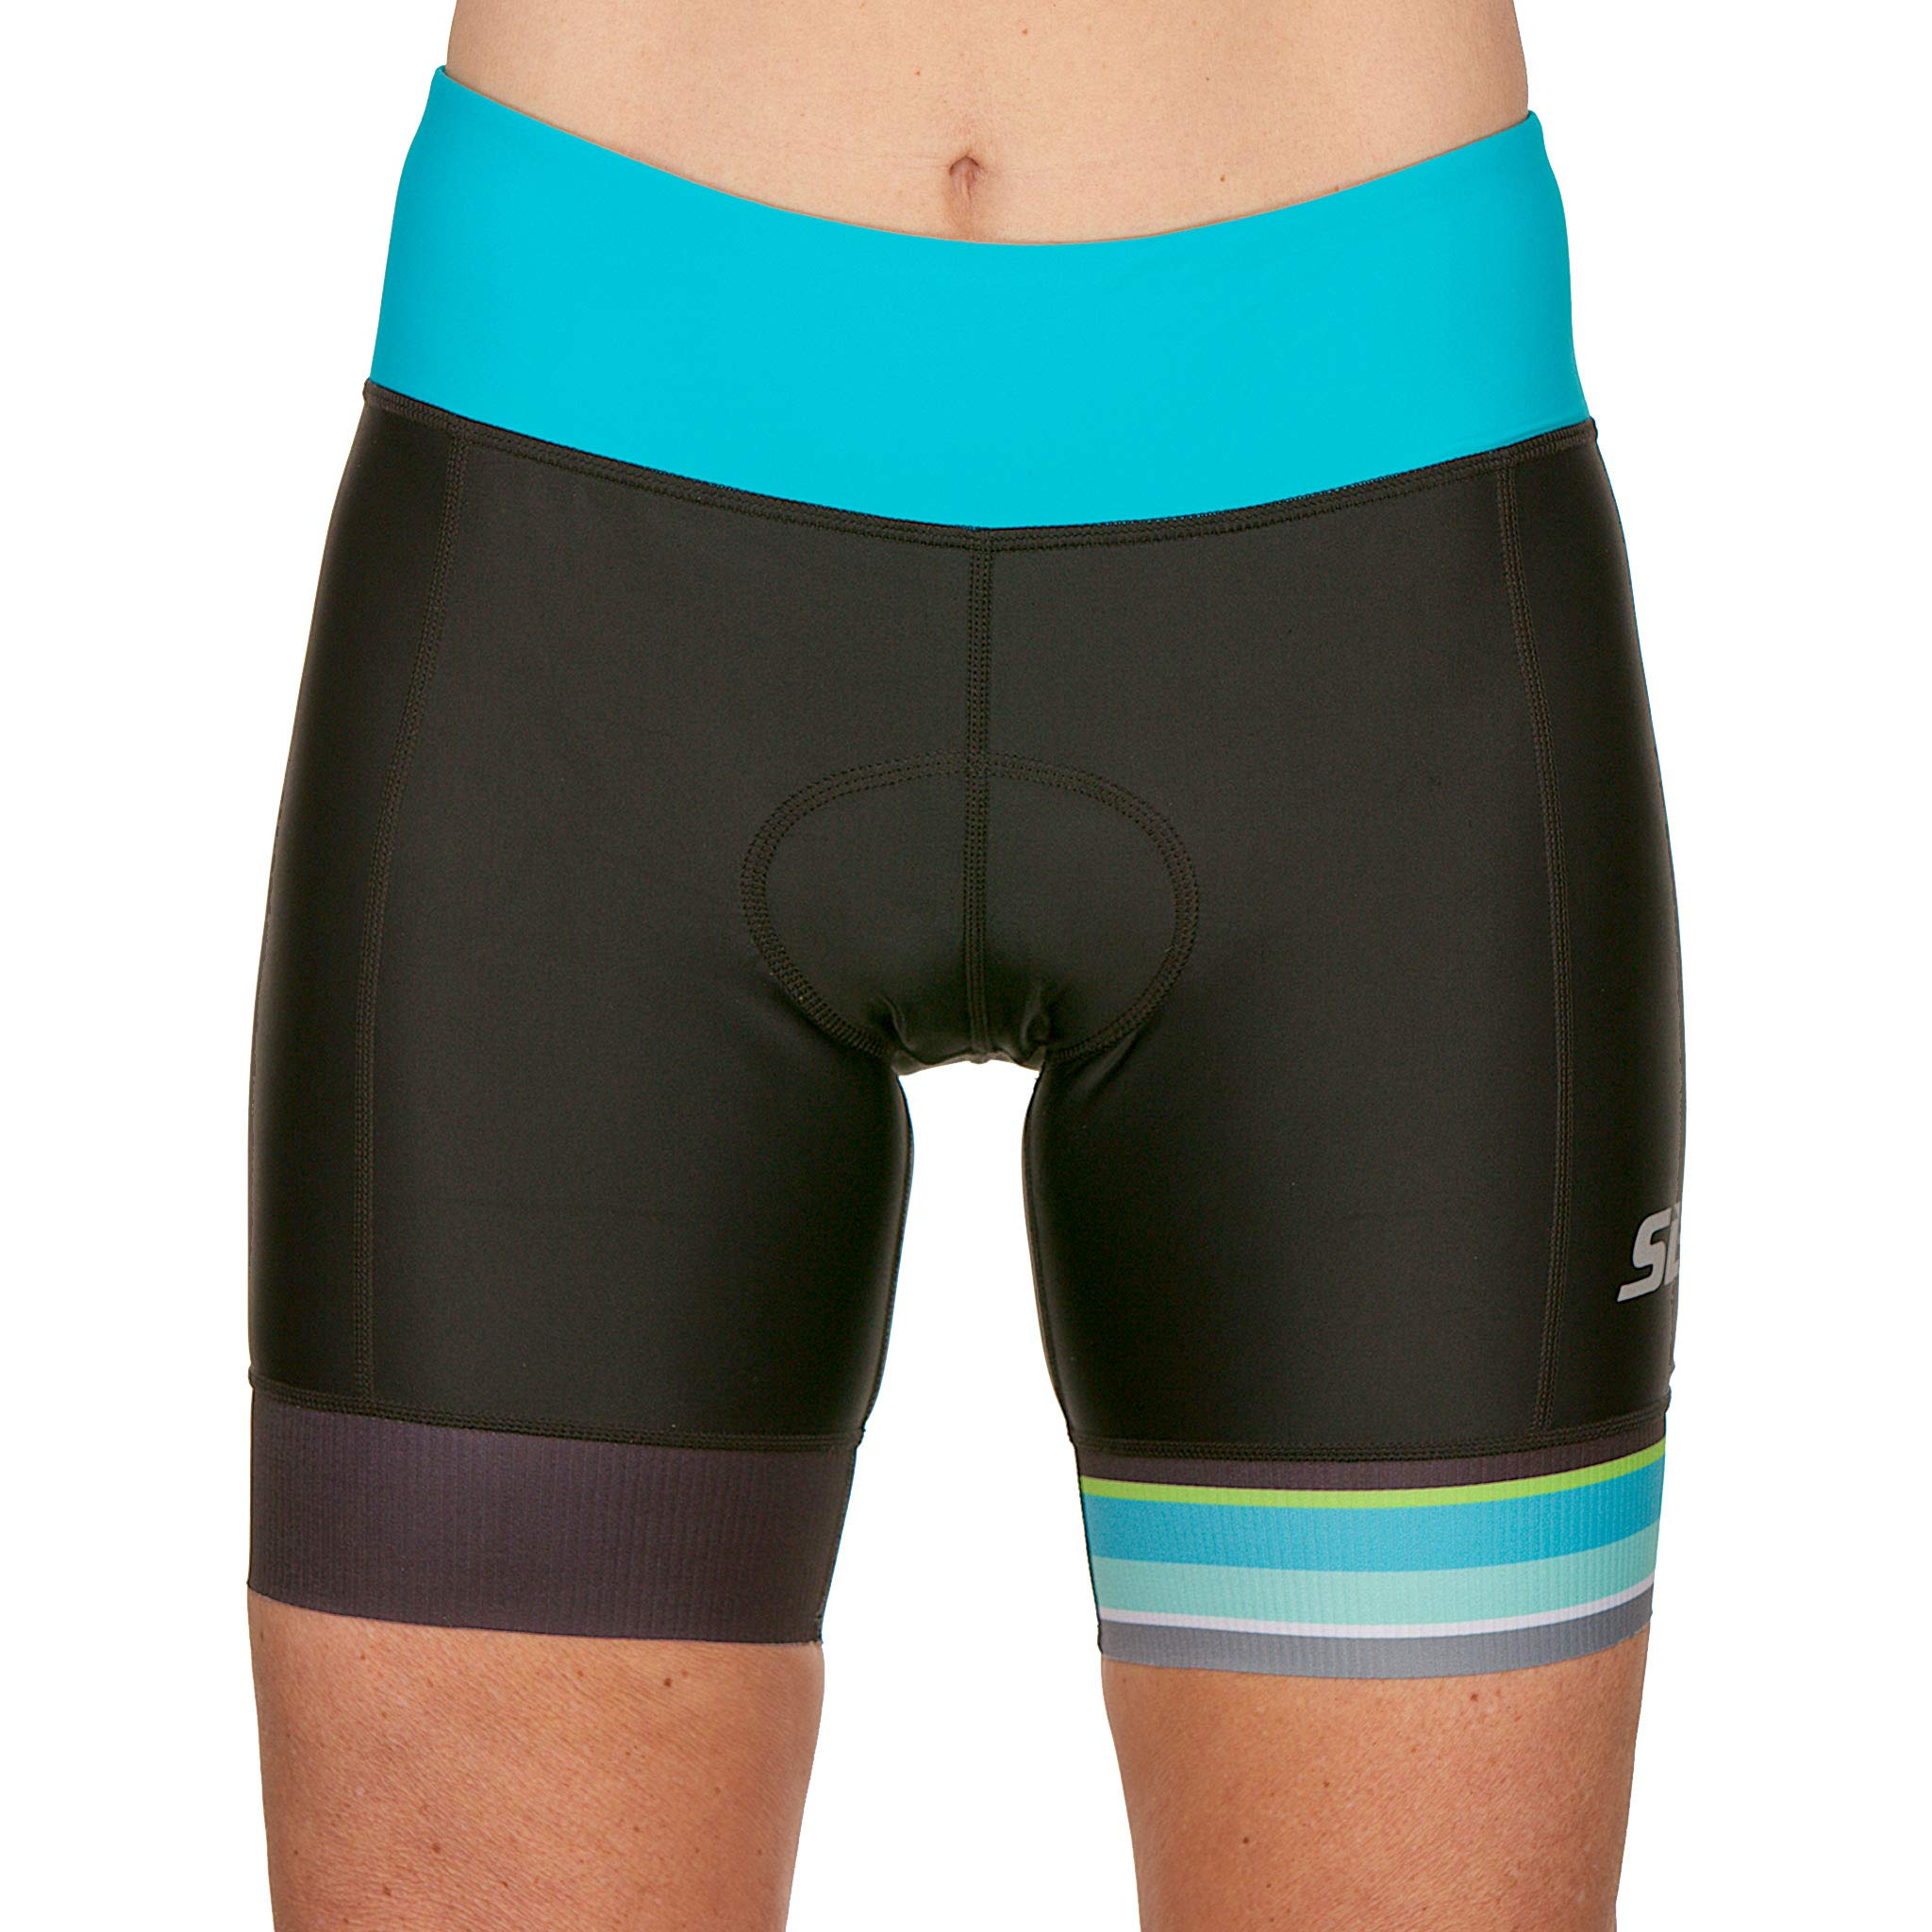 SLS3 Womens Triathlon Shorts FRT | 6 inch Black Women Tri Short | Super Comfy Tri-Shorts with Soft Chamois | German Designed (Black/Martinica Blue, Small)